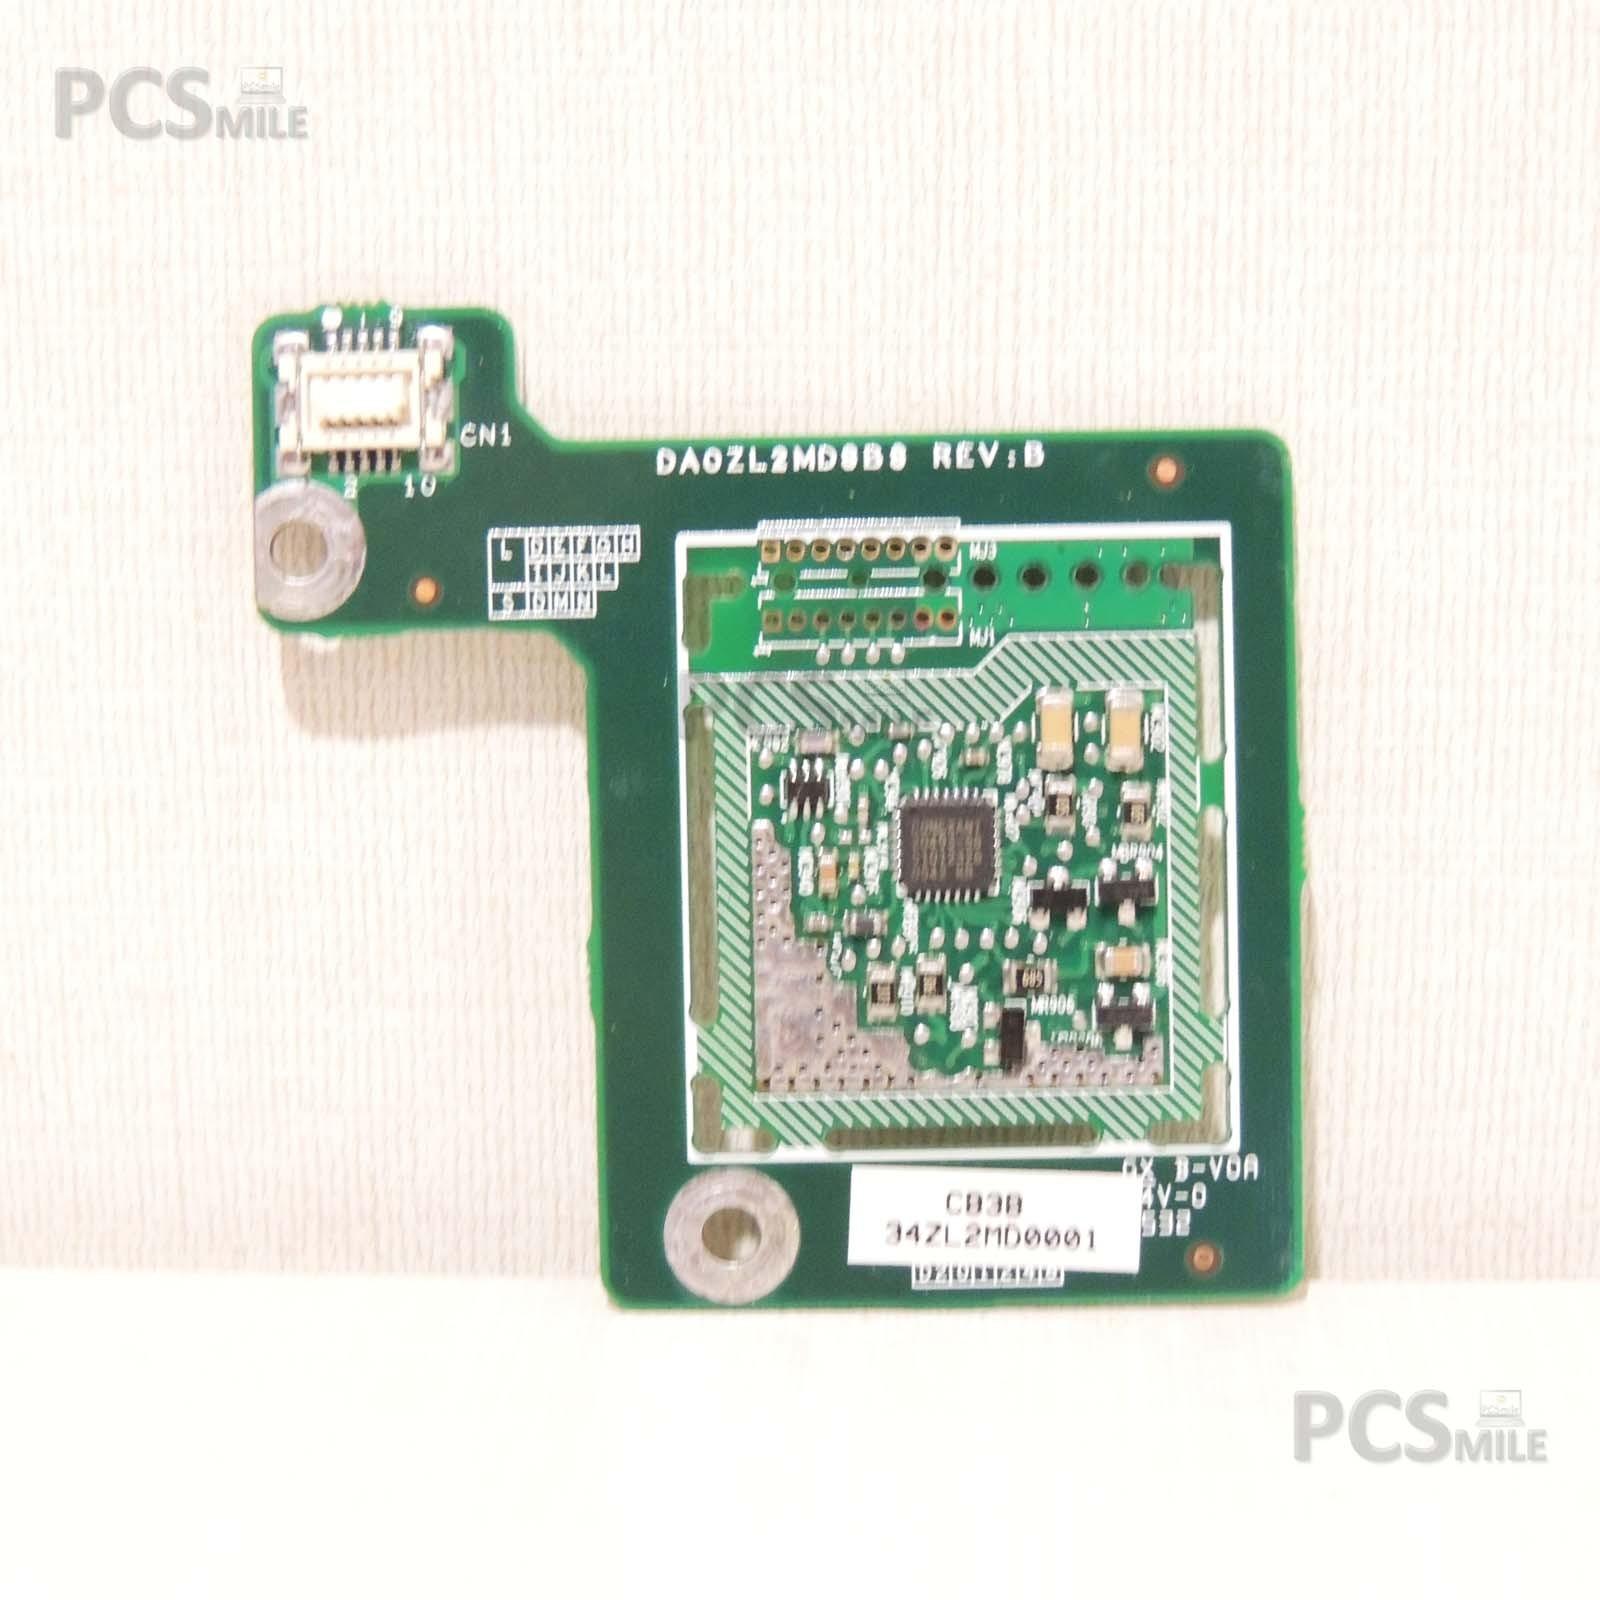 Acer Aspire 1600 ZL3 DA0ZL2MD8B8 REV:B MODEM SCHEDA BOARD